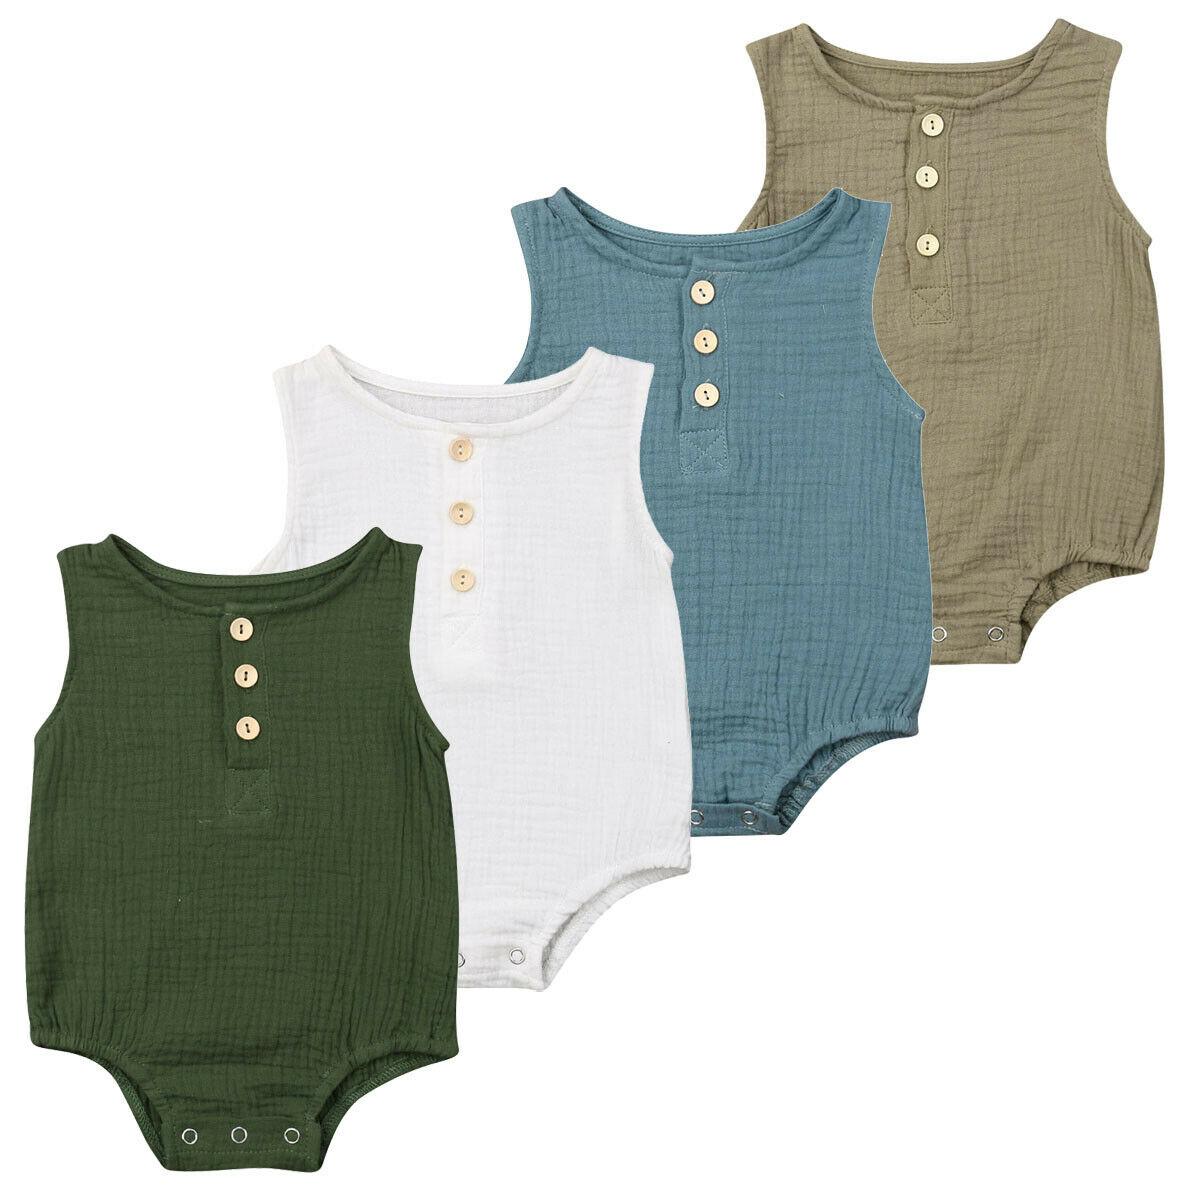 Newborn Infant Baby Girls Boy Sleeveless Solid Color Cotton Linen   Romper   Jumpsuit Clothes